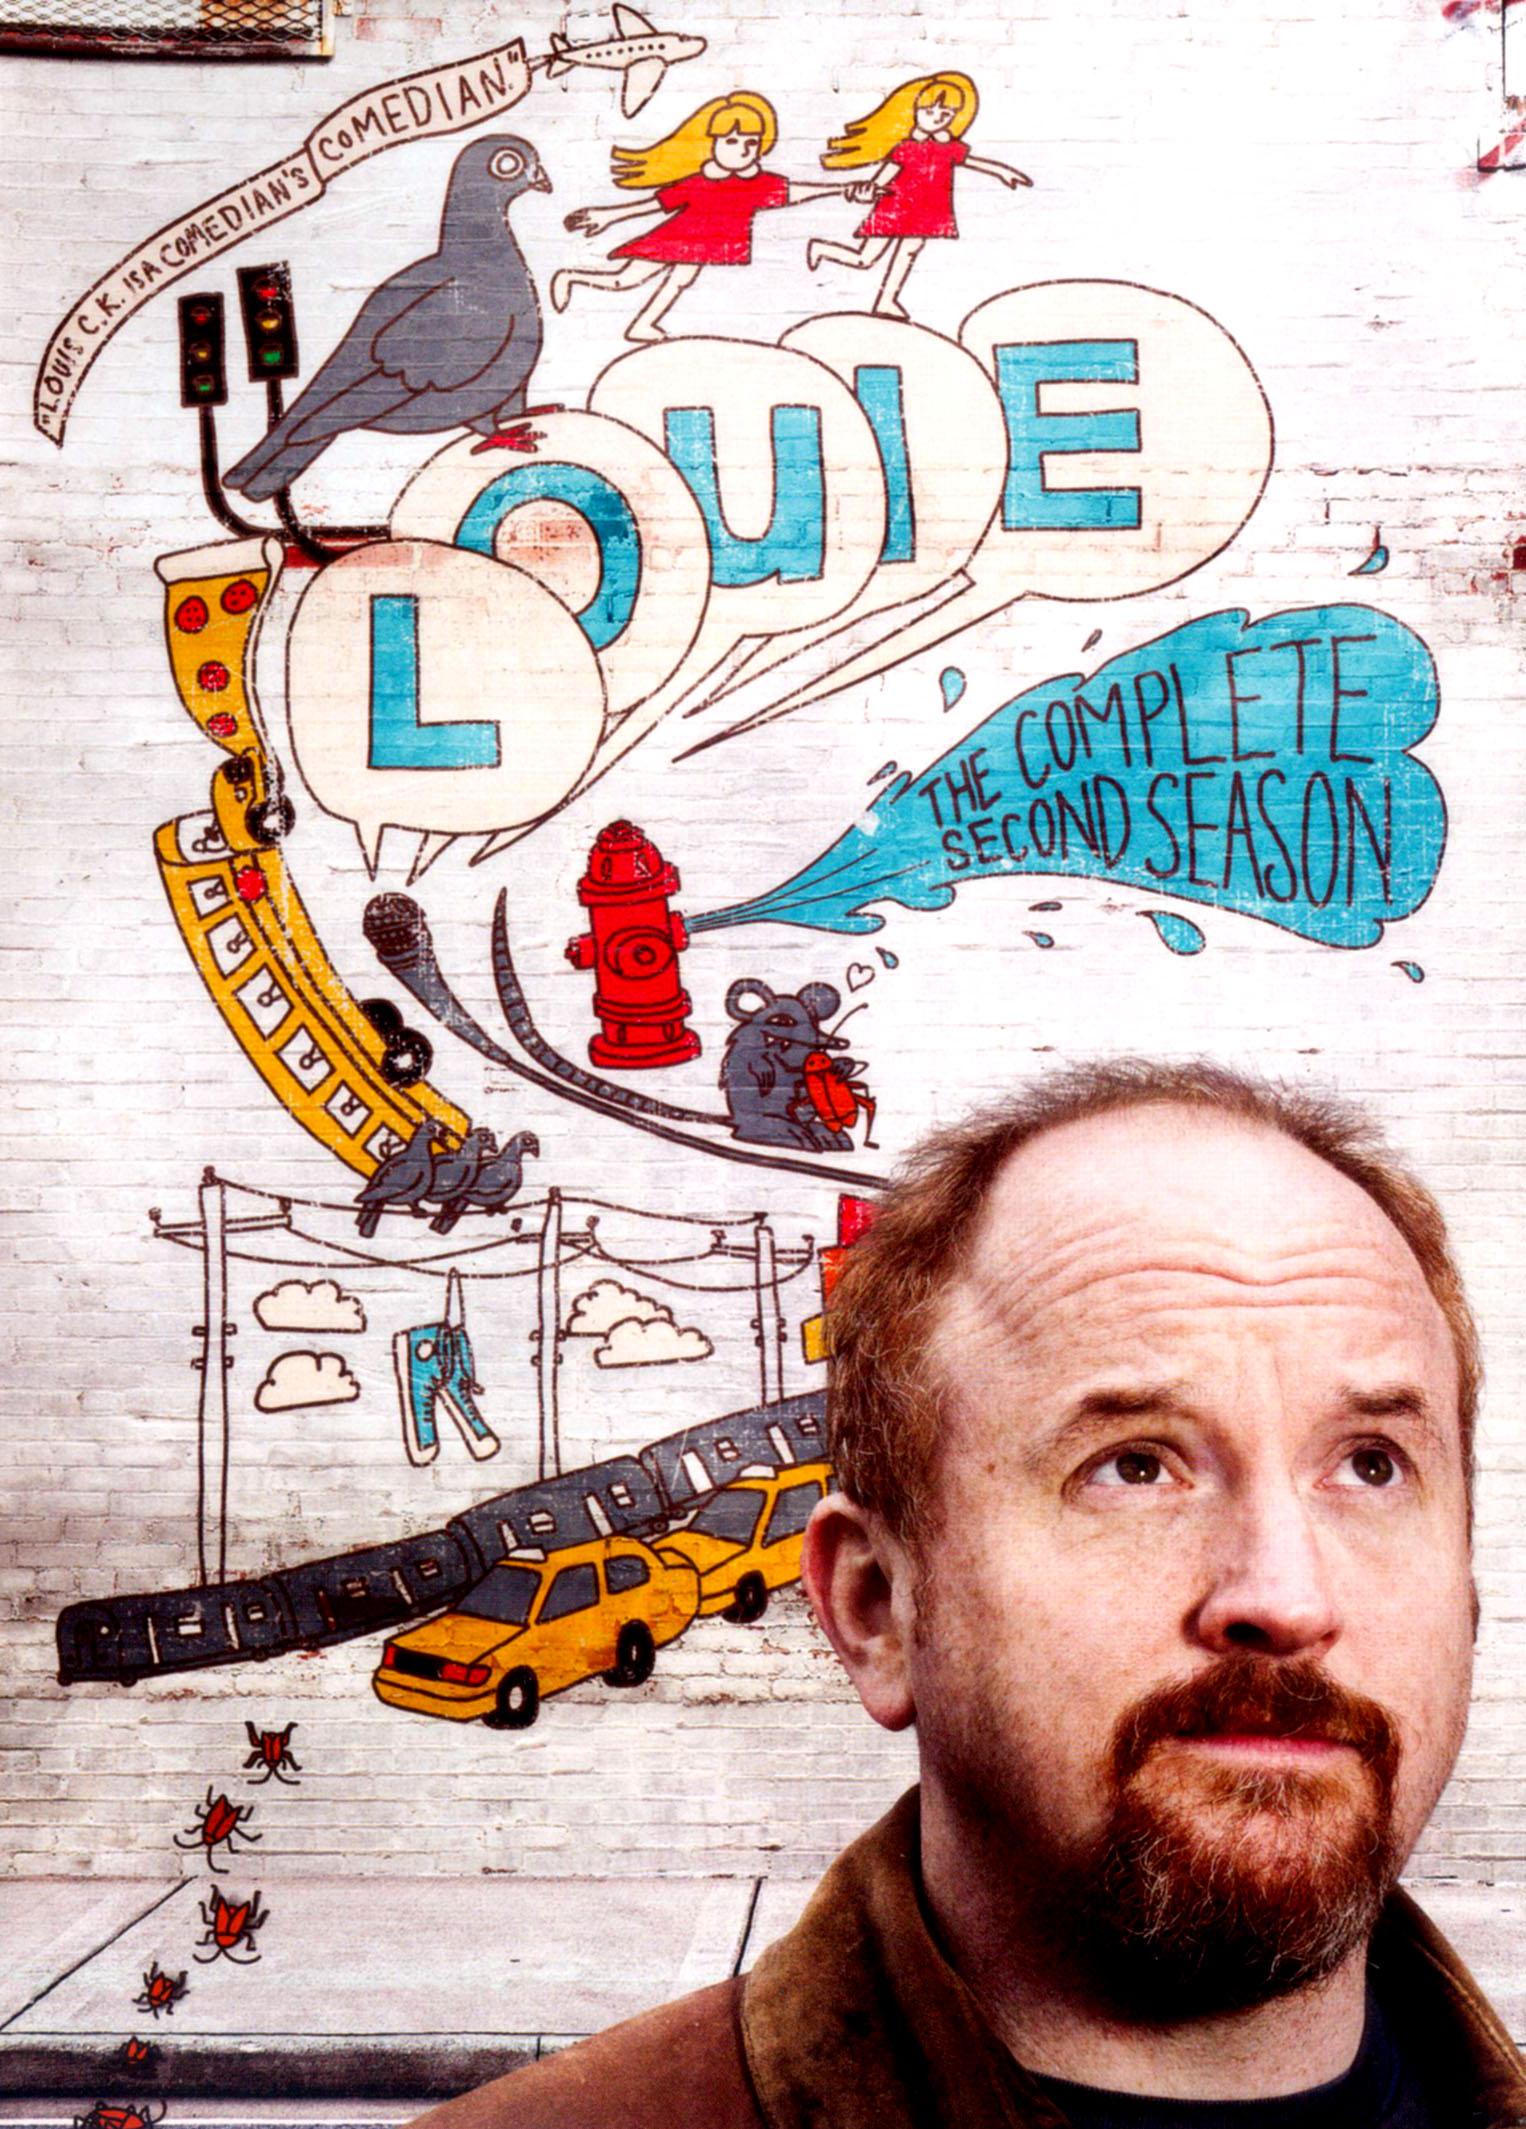 Louie: The Complete Second Season [2 Discs] (dvd) 5587931